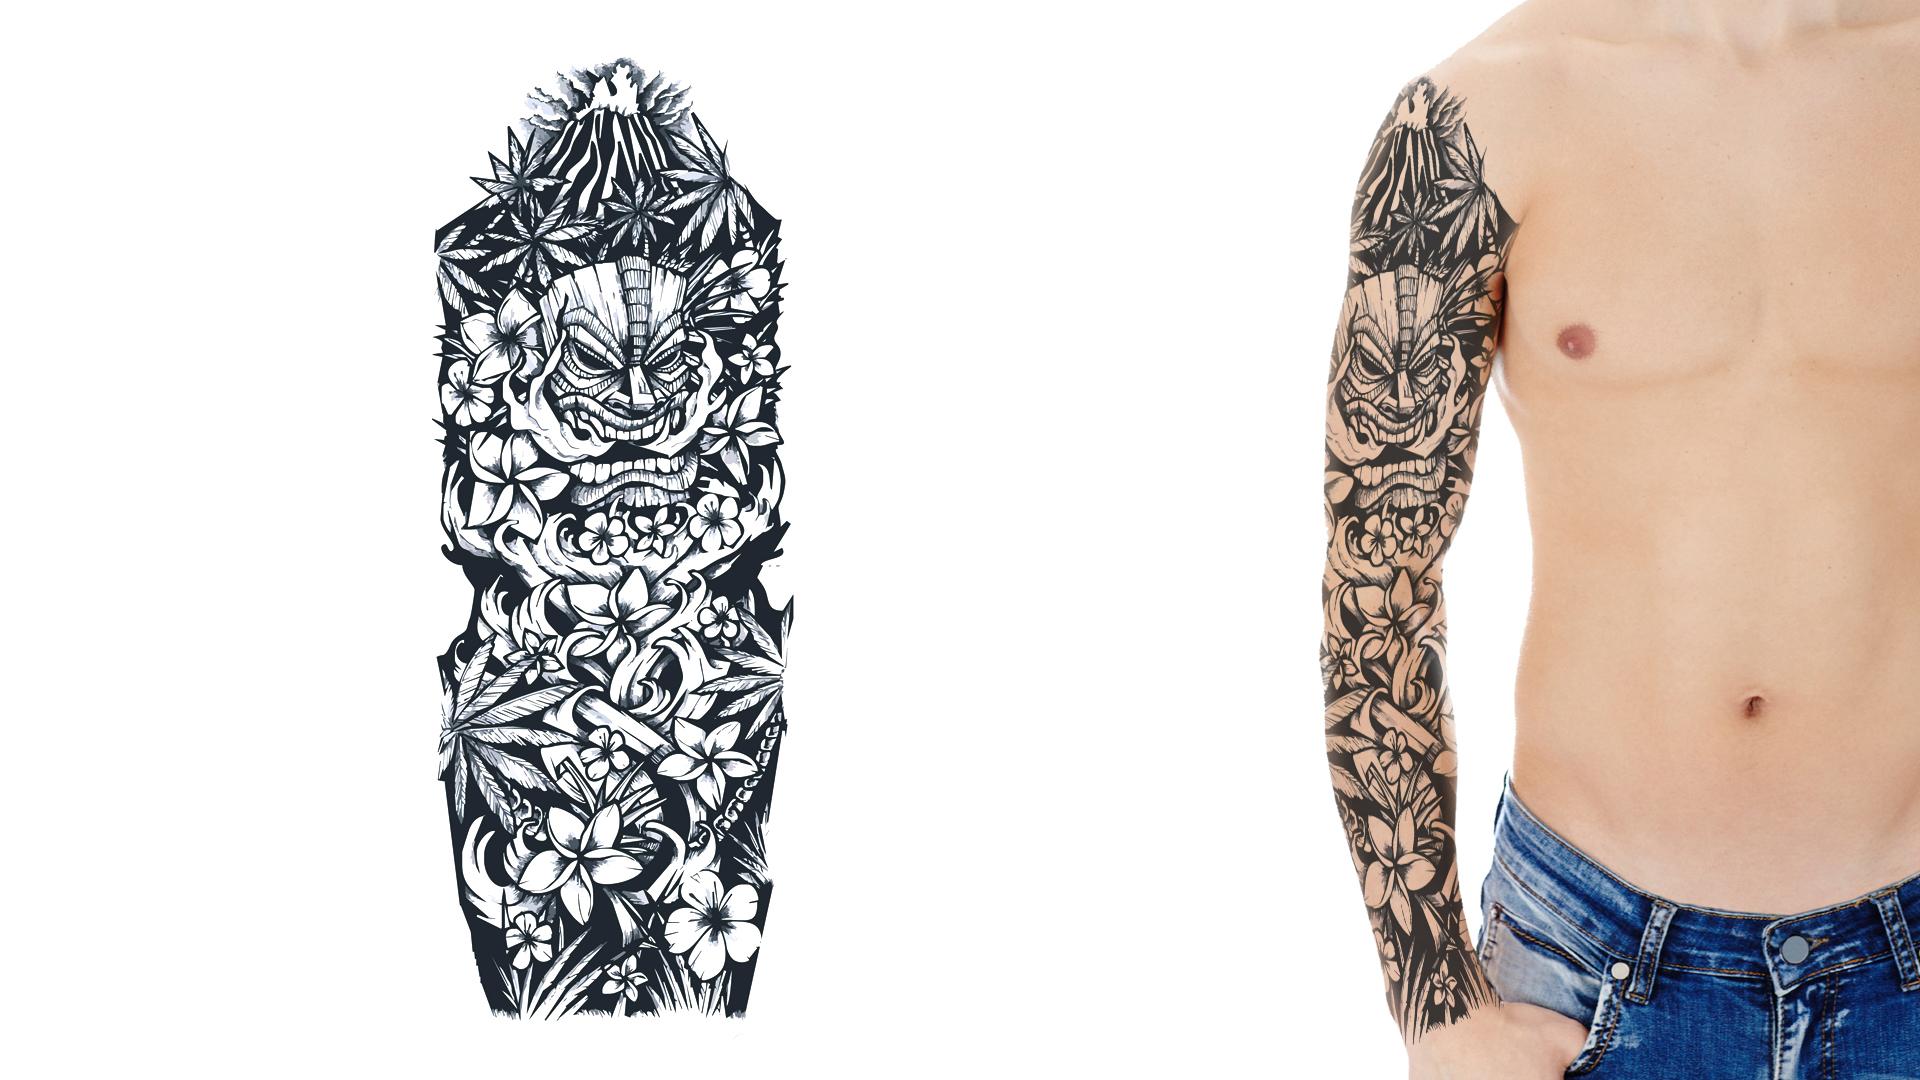 28 how to design full sleeve tattoo design a sleeve tattoo cool tattoos bonbaden tattoos. Black Bedroom Furniture Sets. Home Design Ideas